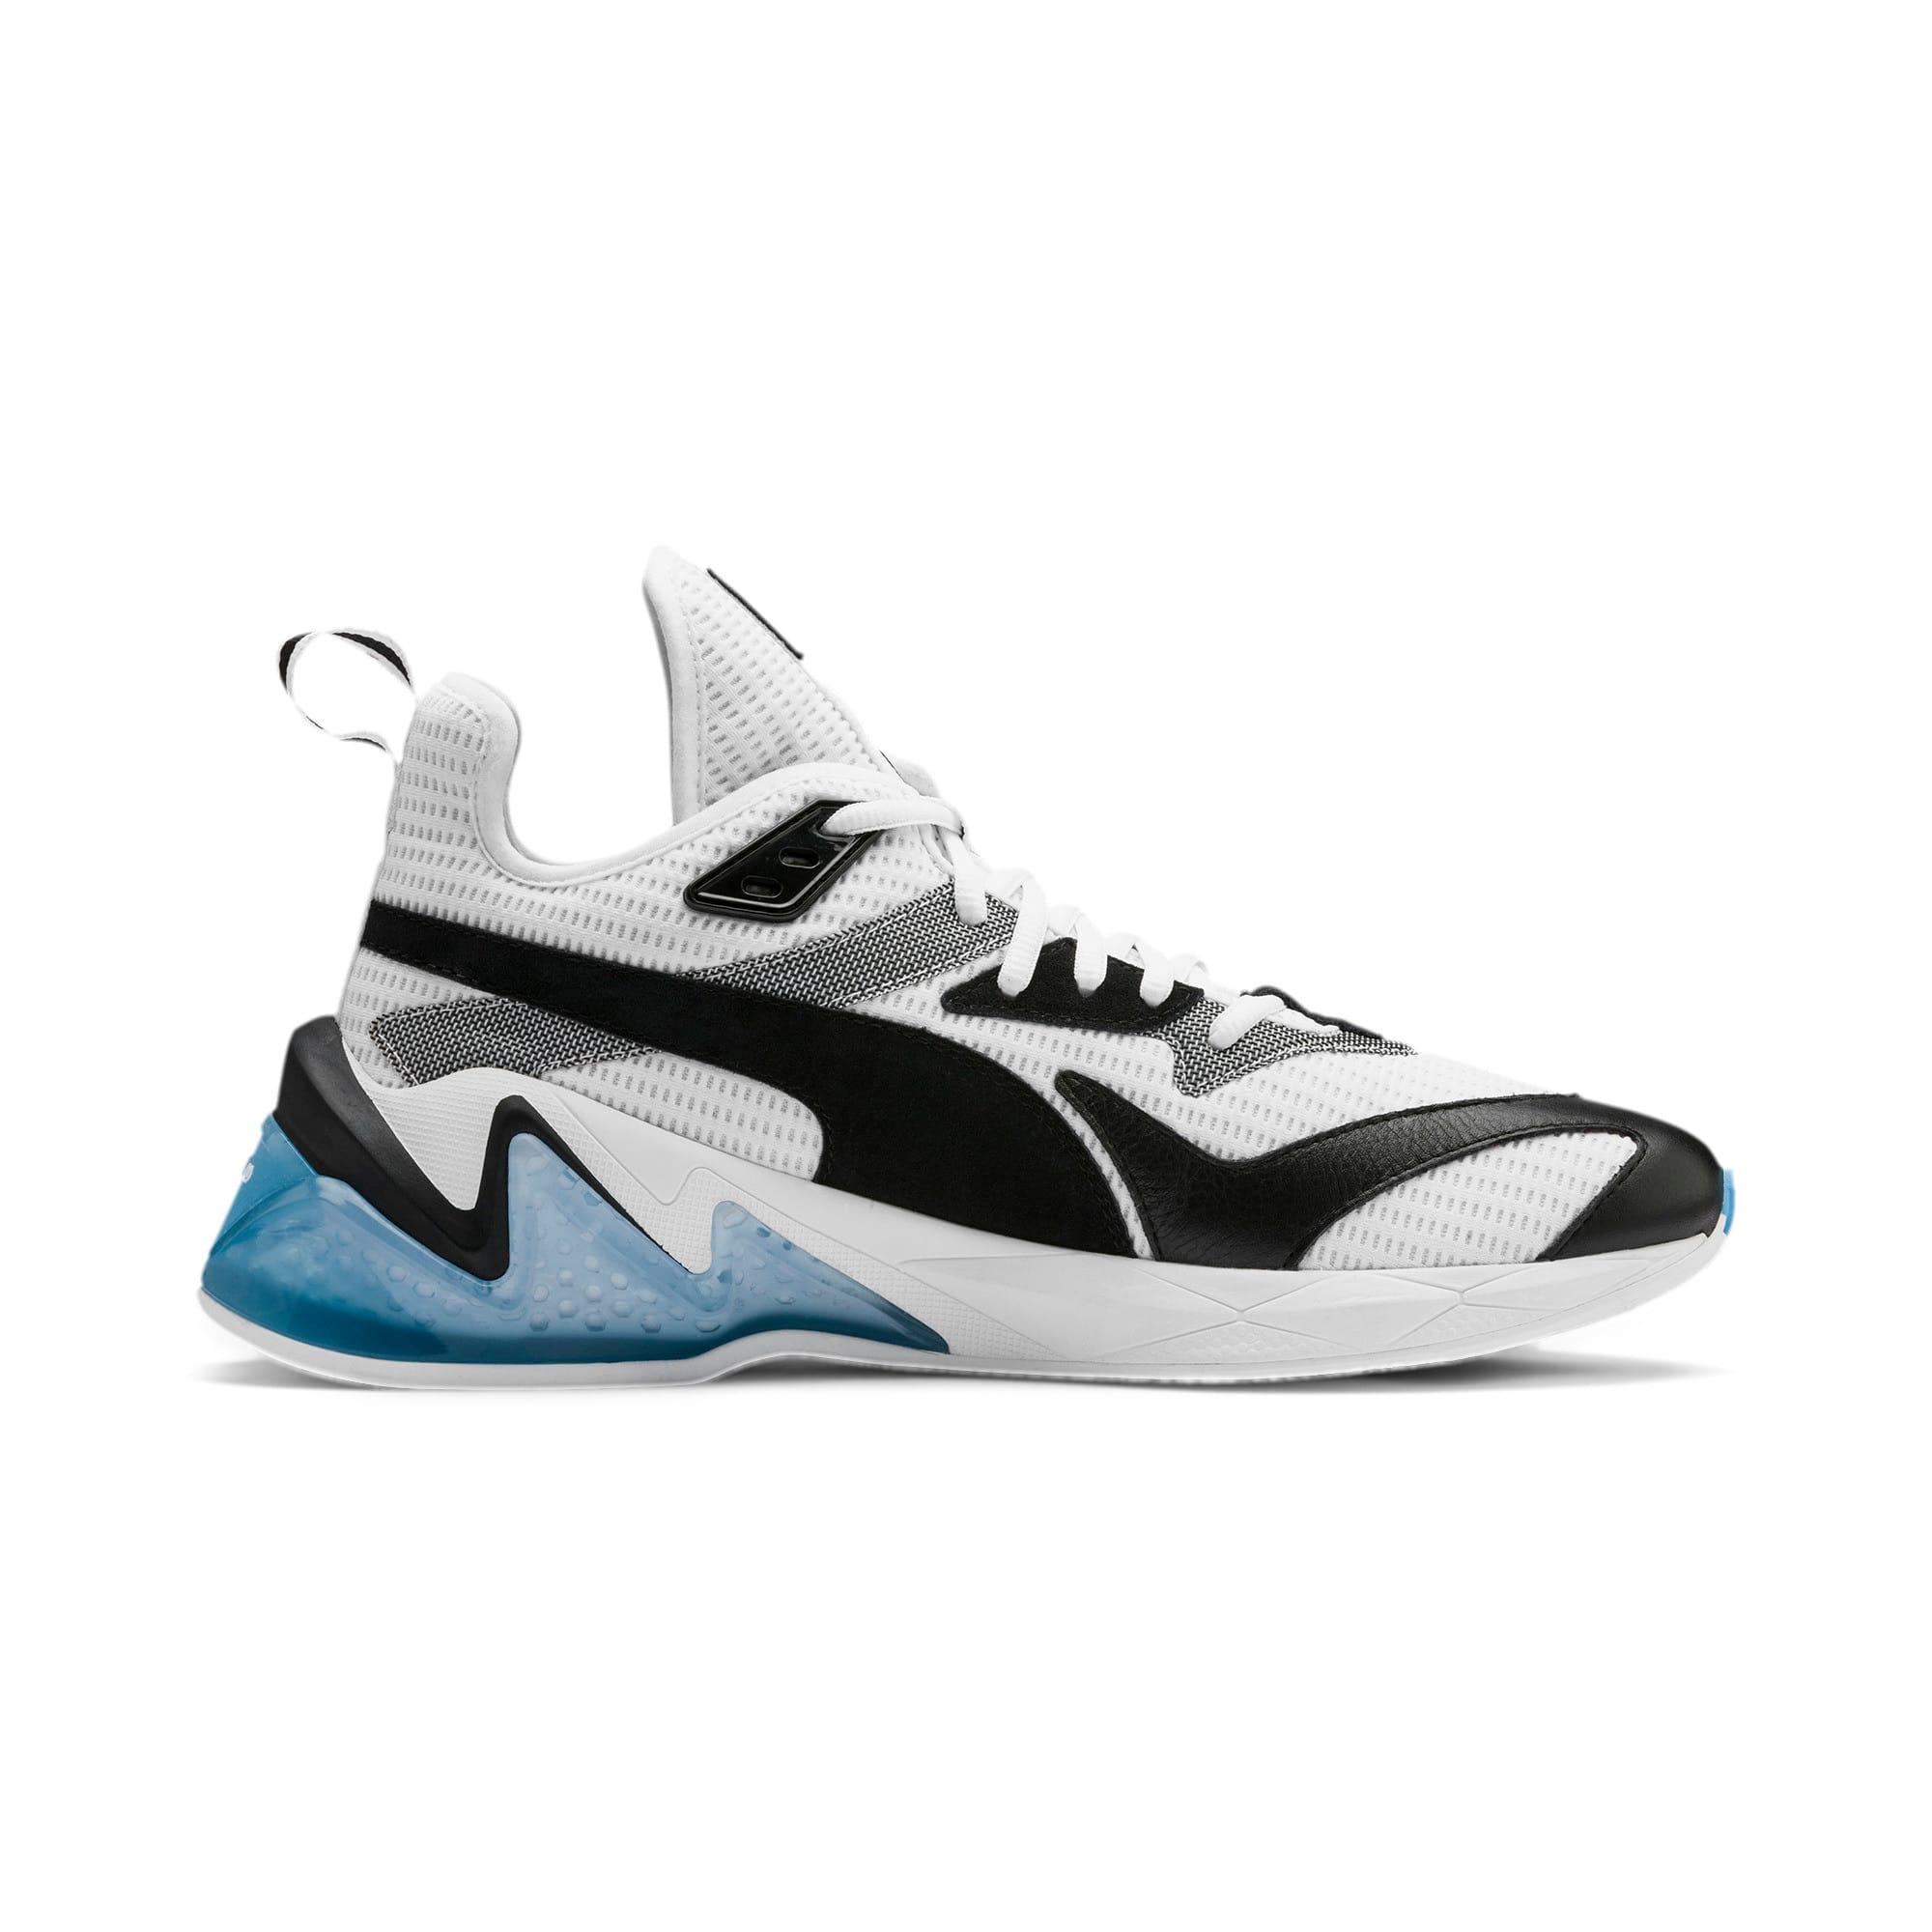 Thumbnail 6 of LQDCELL Origin Men's Training Shoes, Puma White-Puma Black, medium